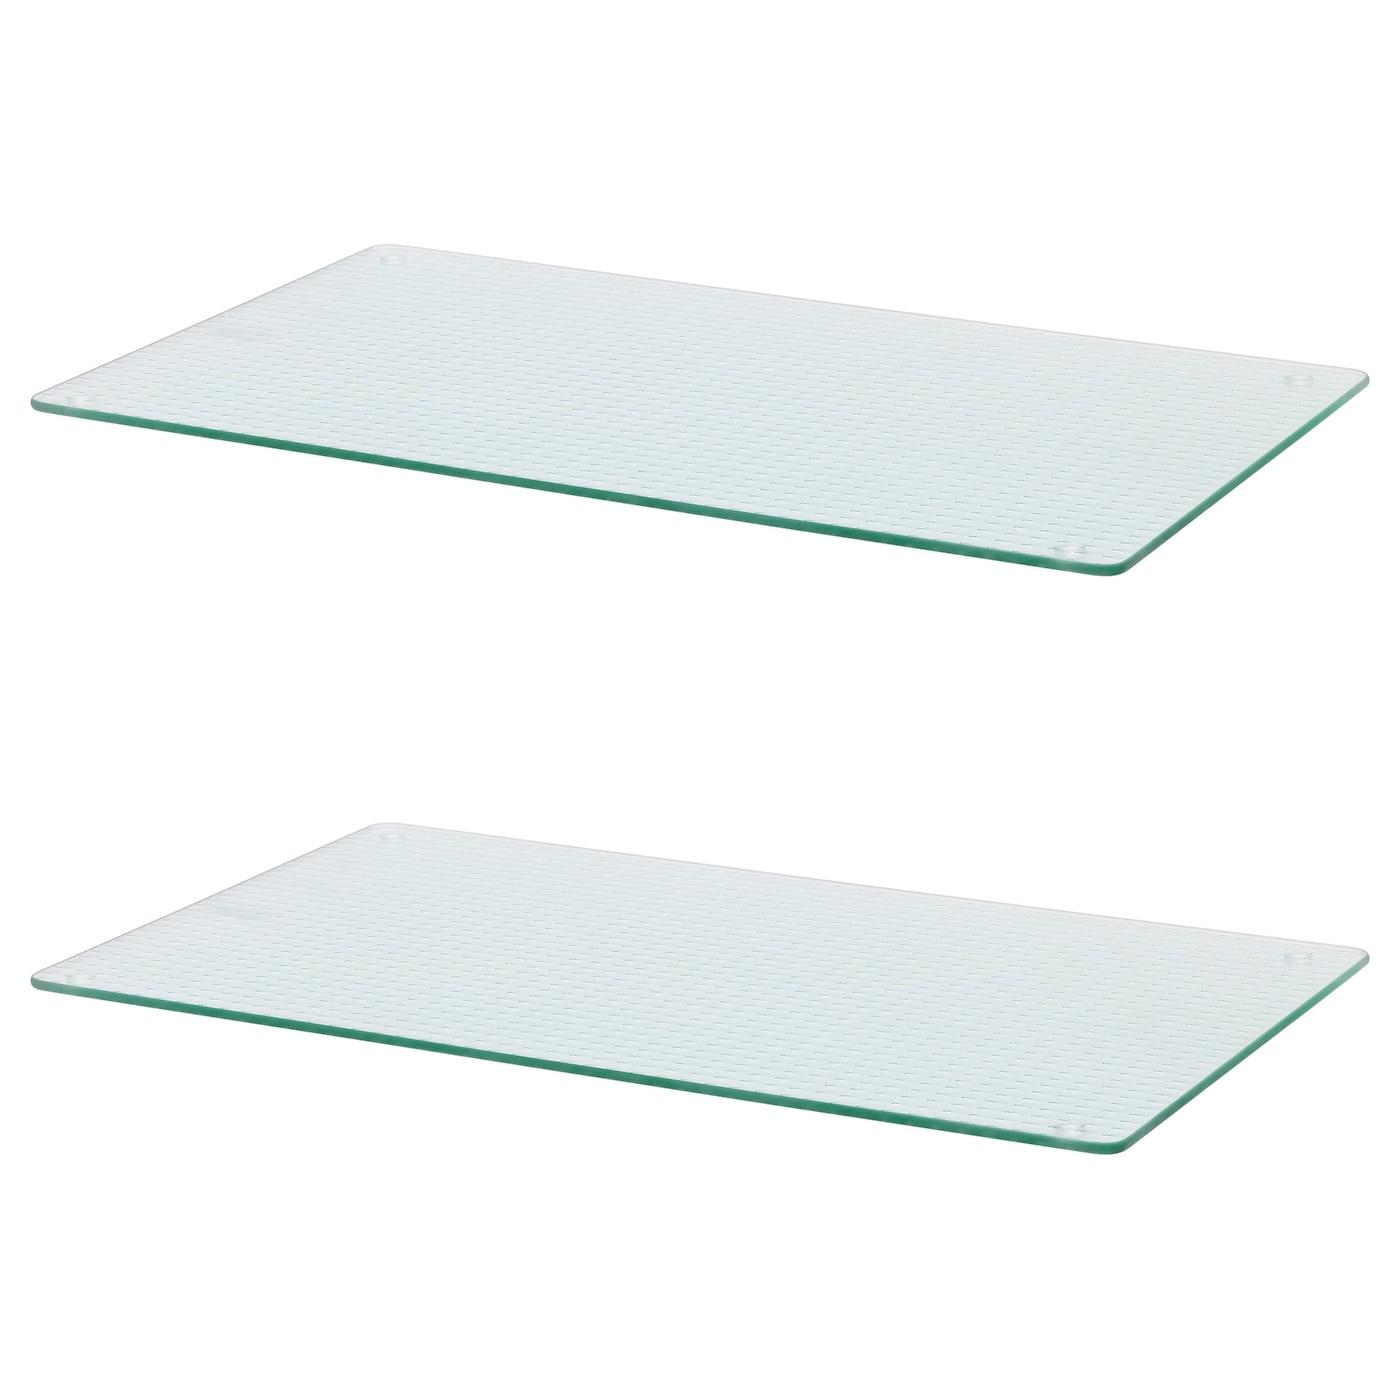 insug hob cover glass 52x30 cm ikea. Black Bedroom Furniture Sets. Home Design Ideas